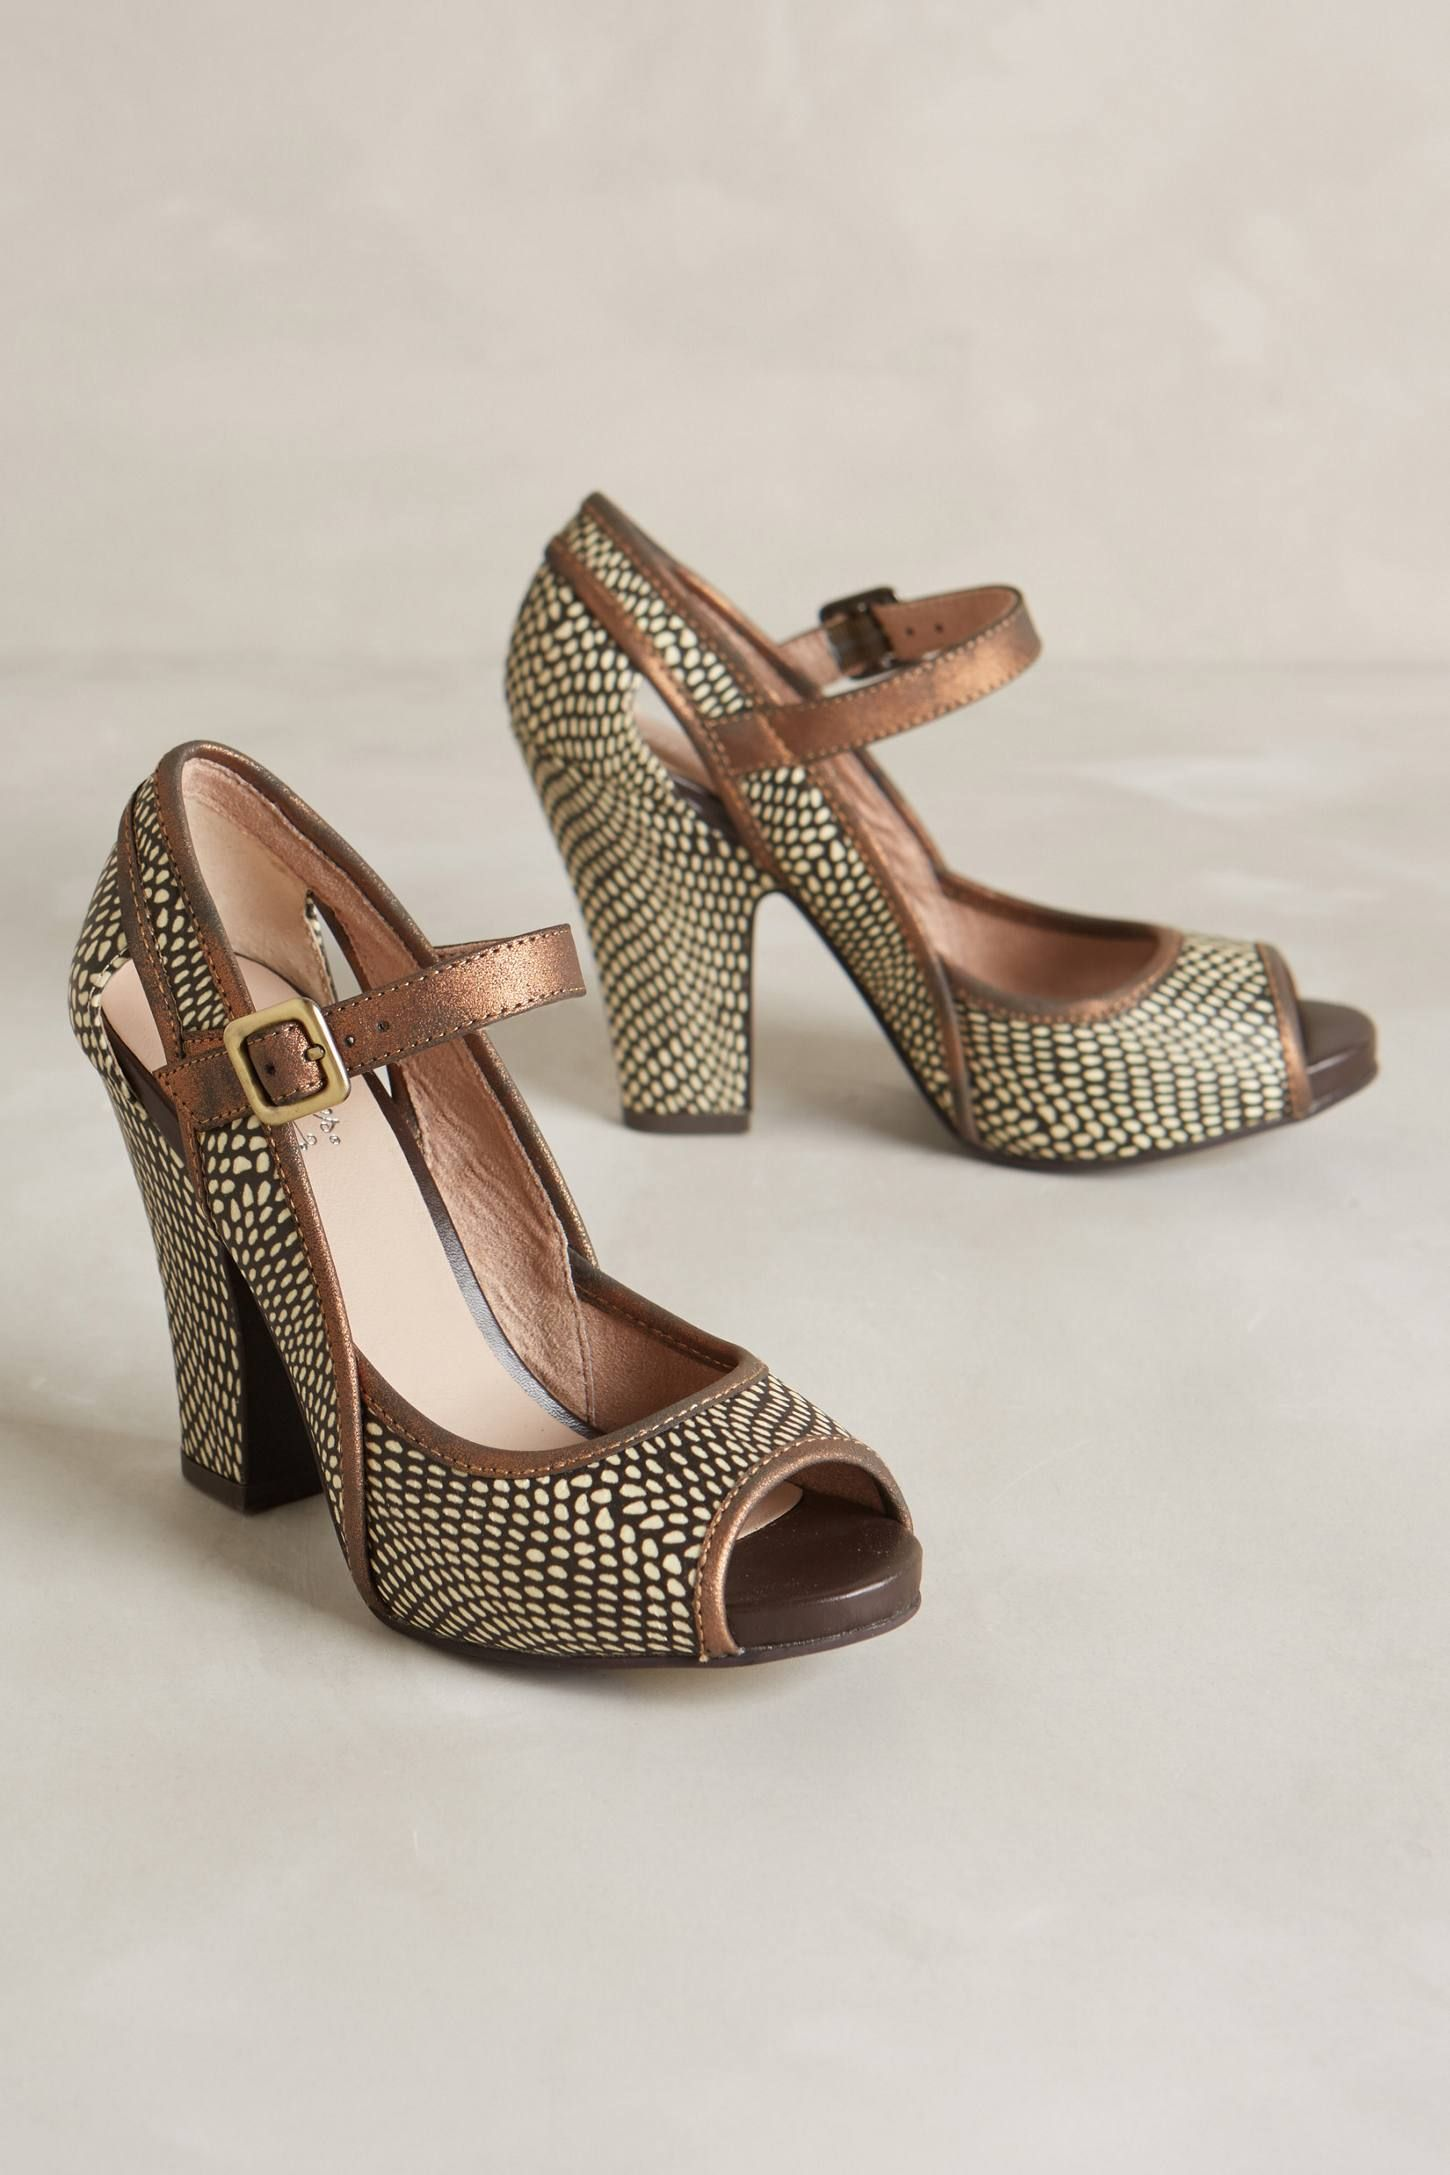 Chaussures - Sandales Post Orteils Raphaella De Booz dCoq0KTg